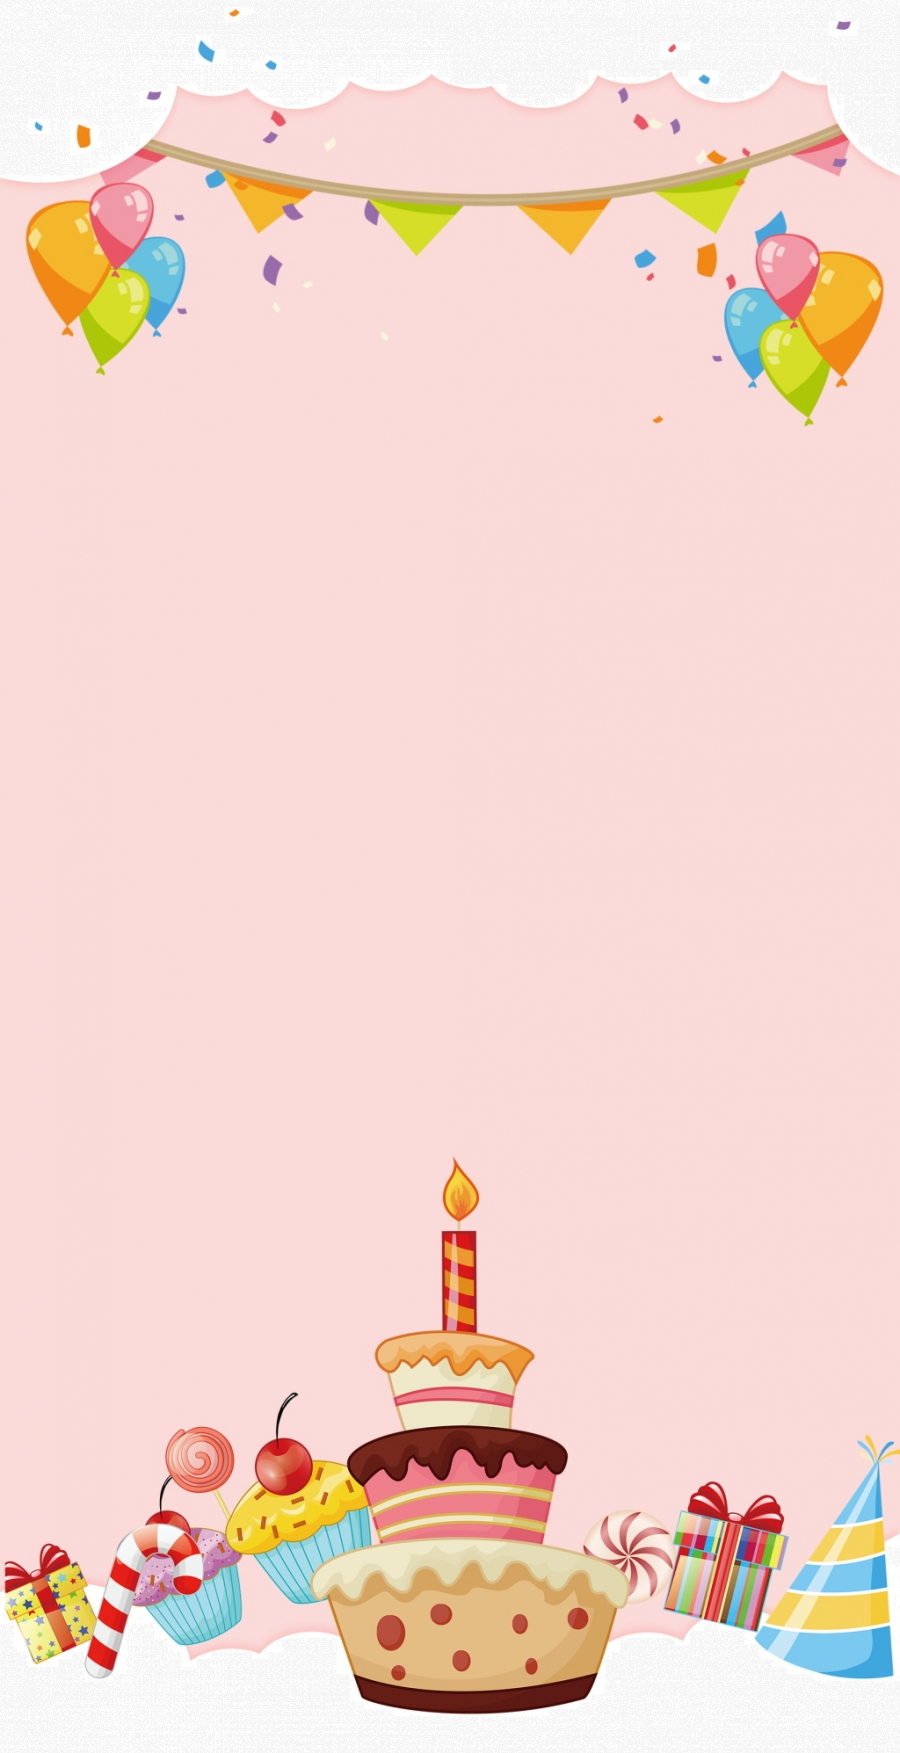 Birthday Invitation Background s Vectors and PSD